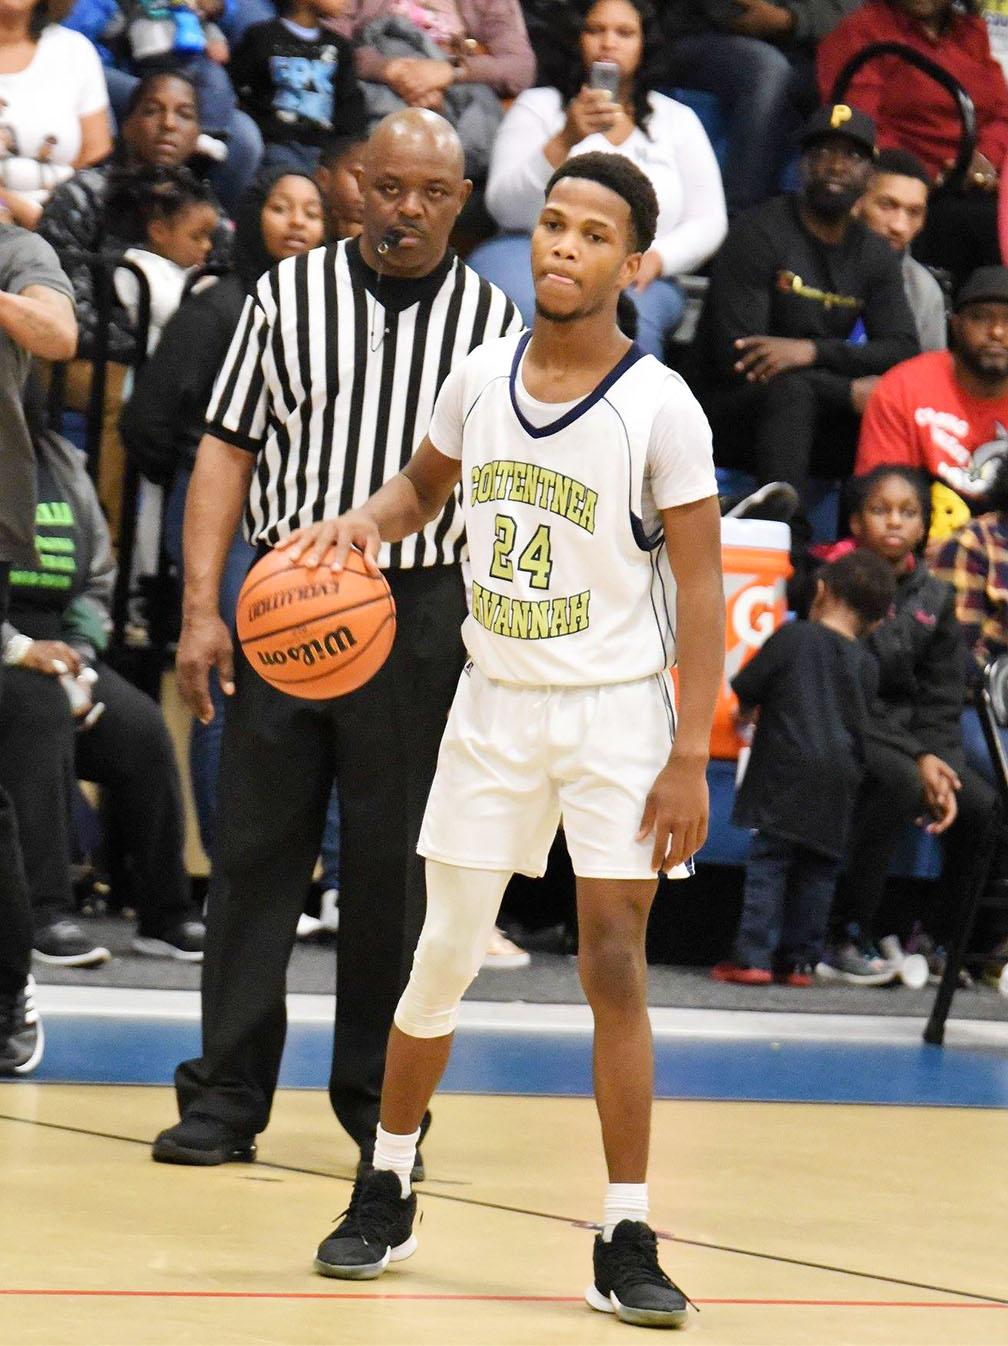 Malik Williams of Contentnea-Savannah School was named the tournament's MVP. Photo by William 'Bud' Hardy / Neuse News